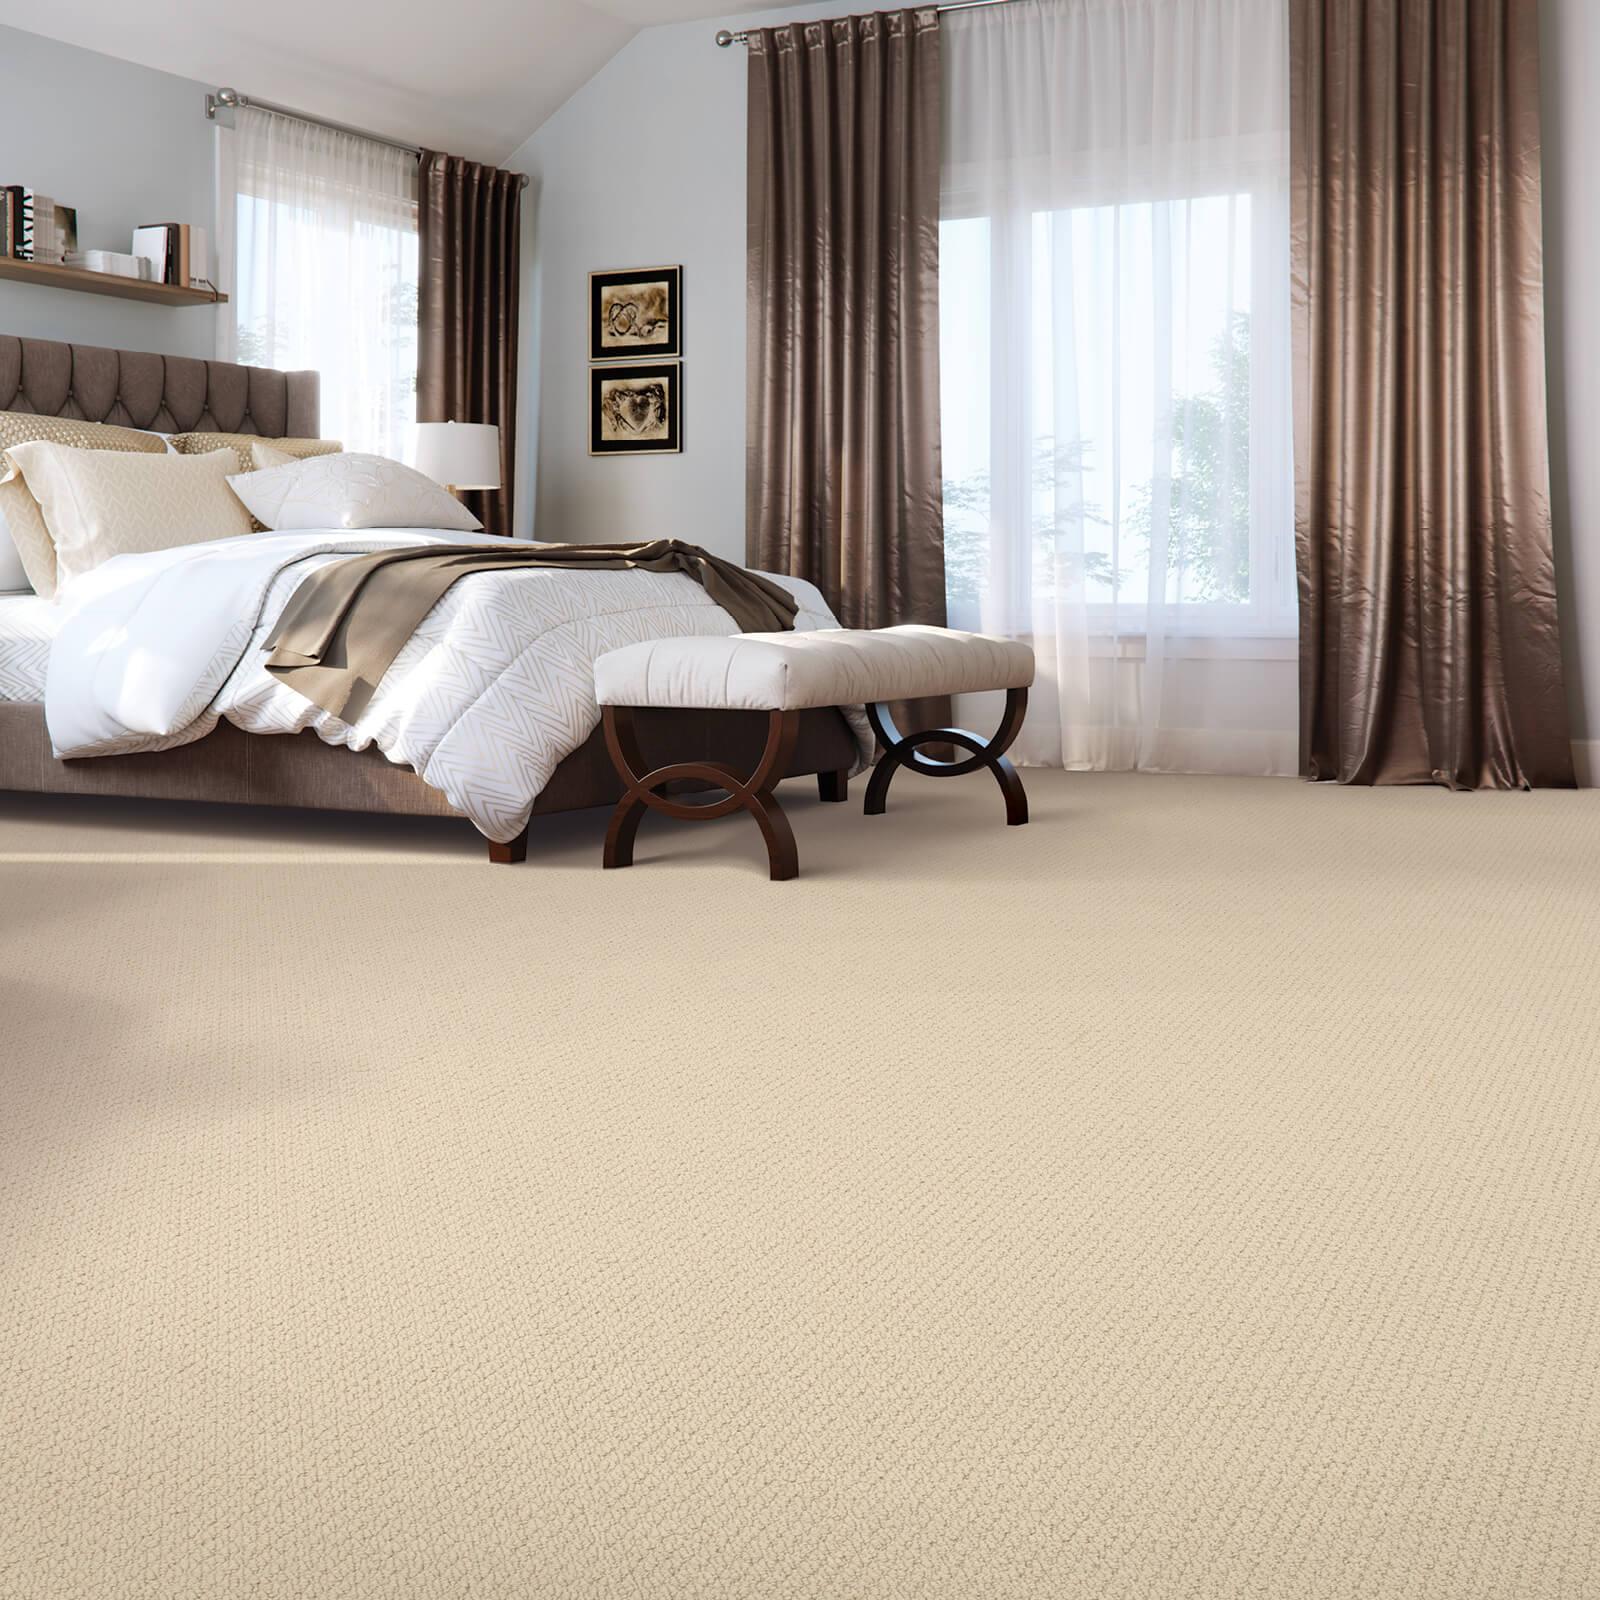 Casual beauty of bedroom | Flooring by Wilson's Carpet Plus